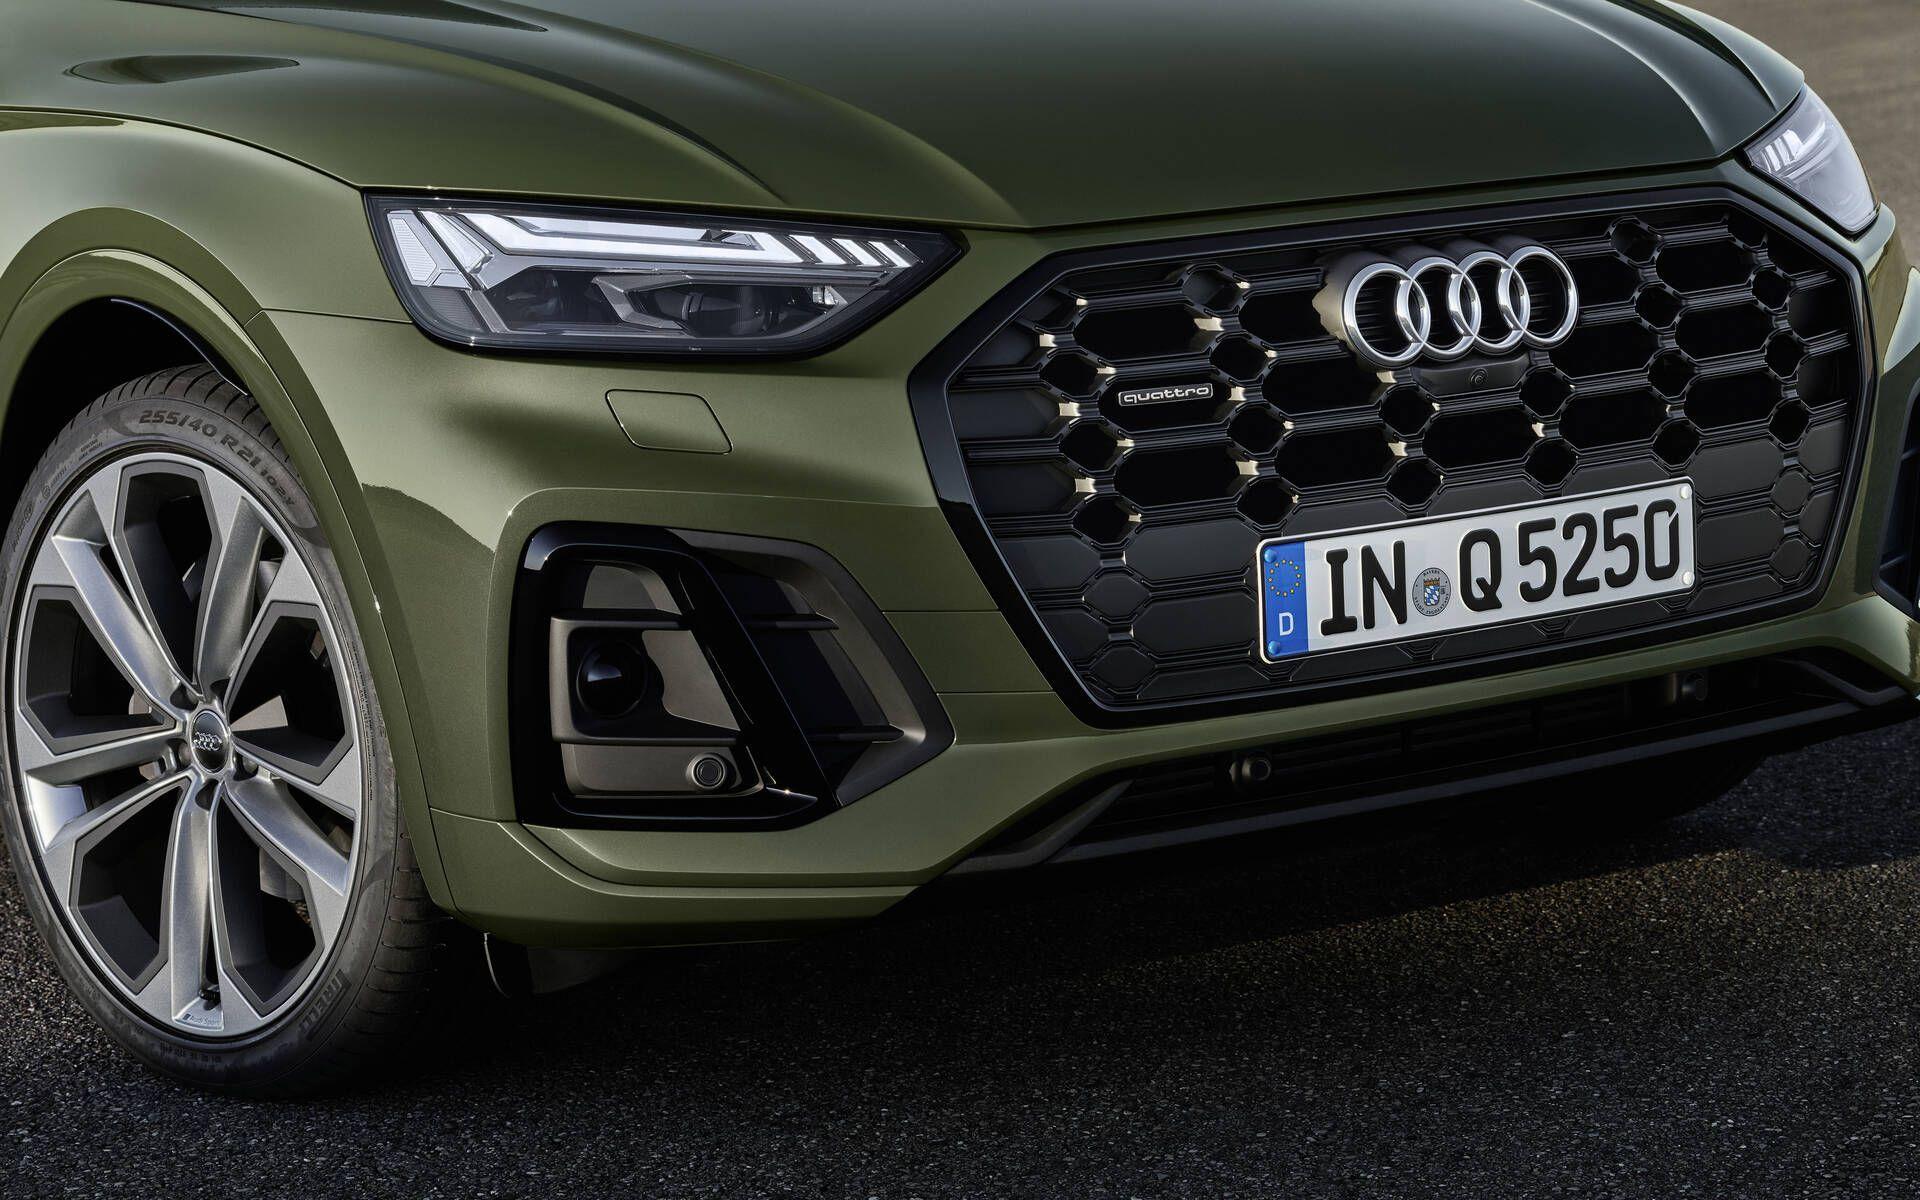 Kelebihan Kekurangan Audi R2 Review